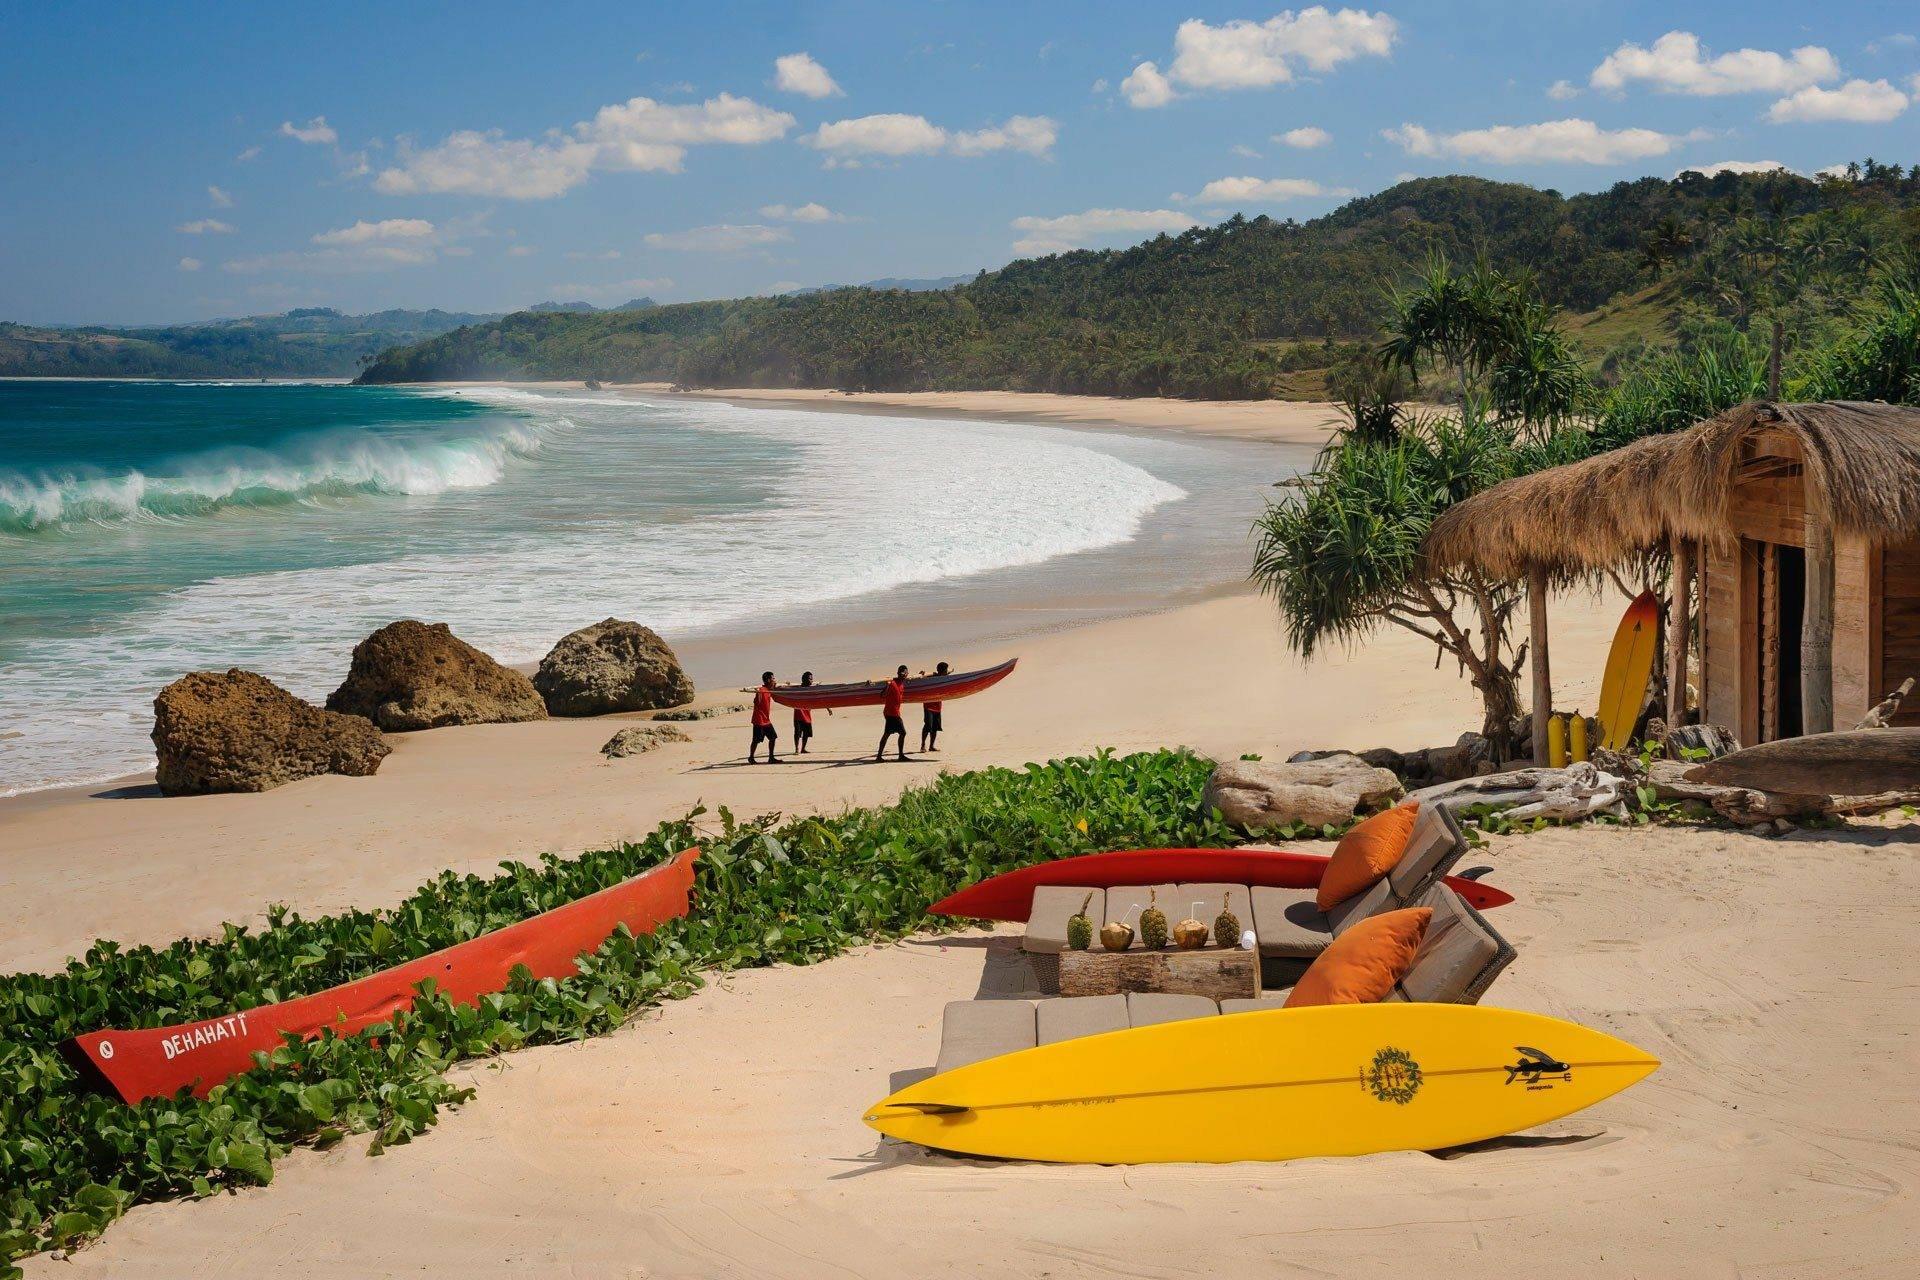 Sumba Surf Camp